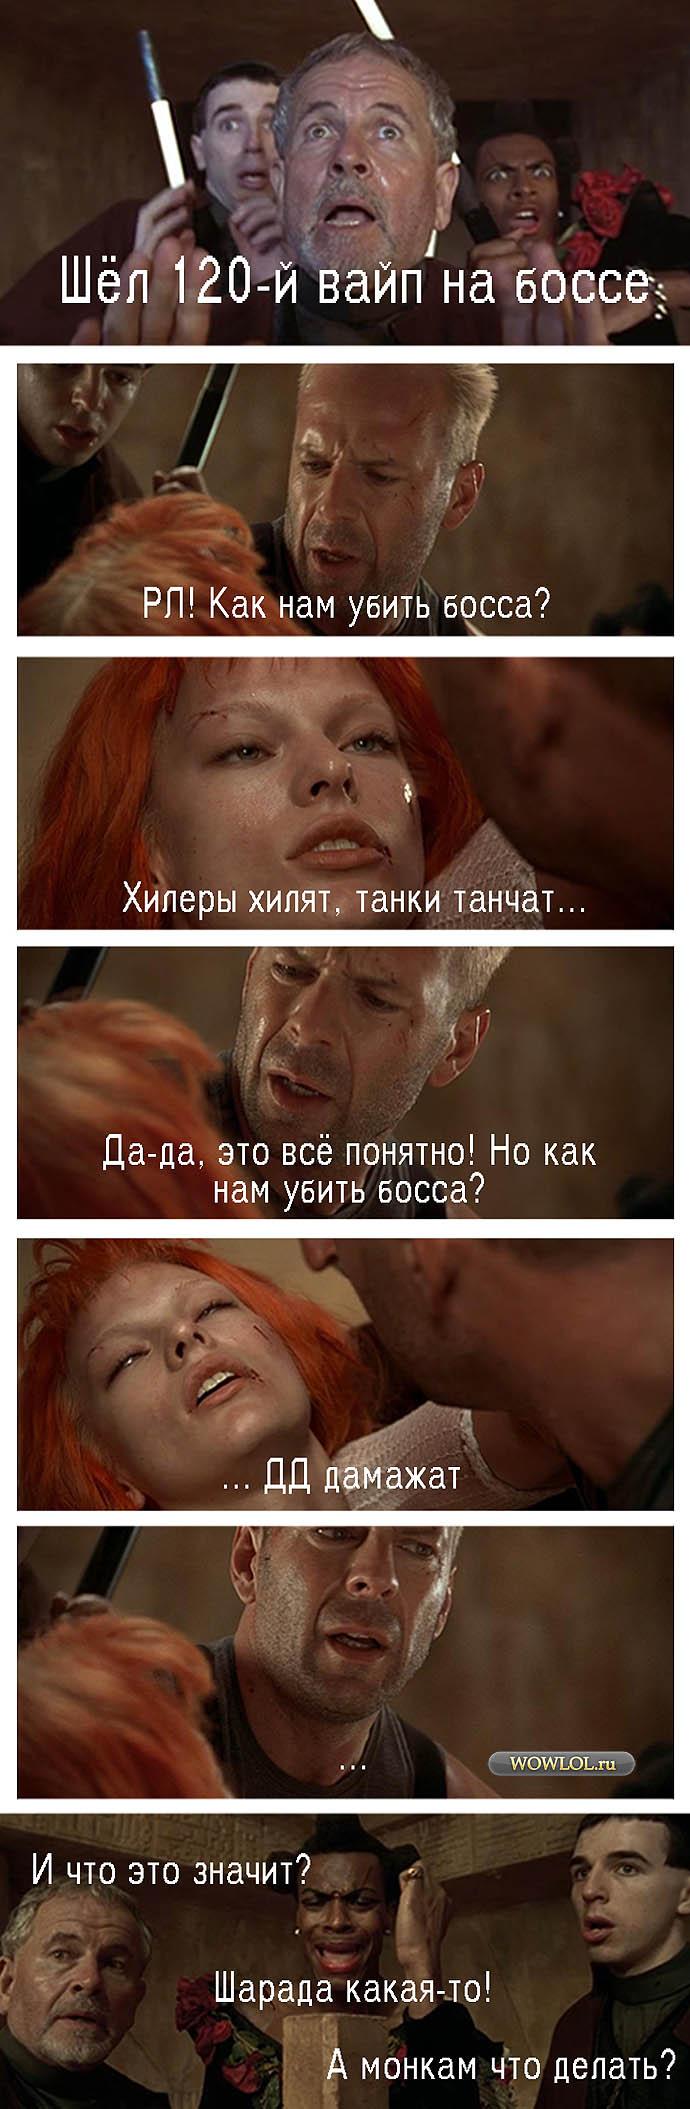 http://wowlol.ru/img3/9ca639af3e6ff5acd801d224ee8d9fbc.jpg